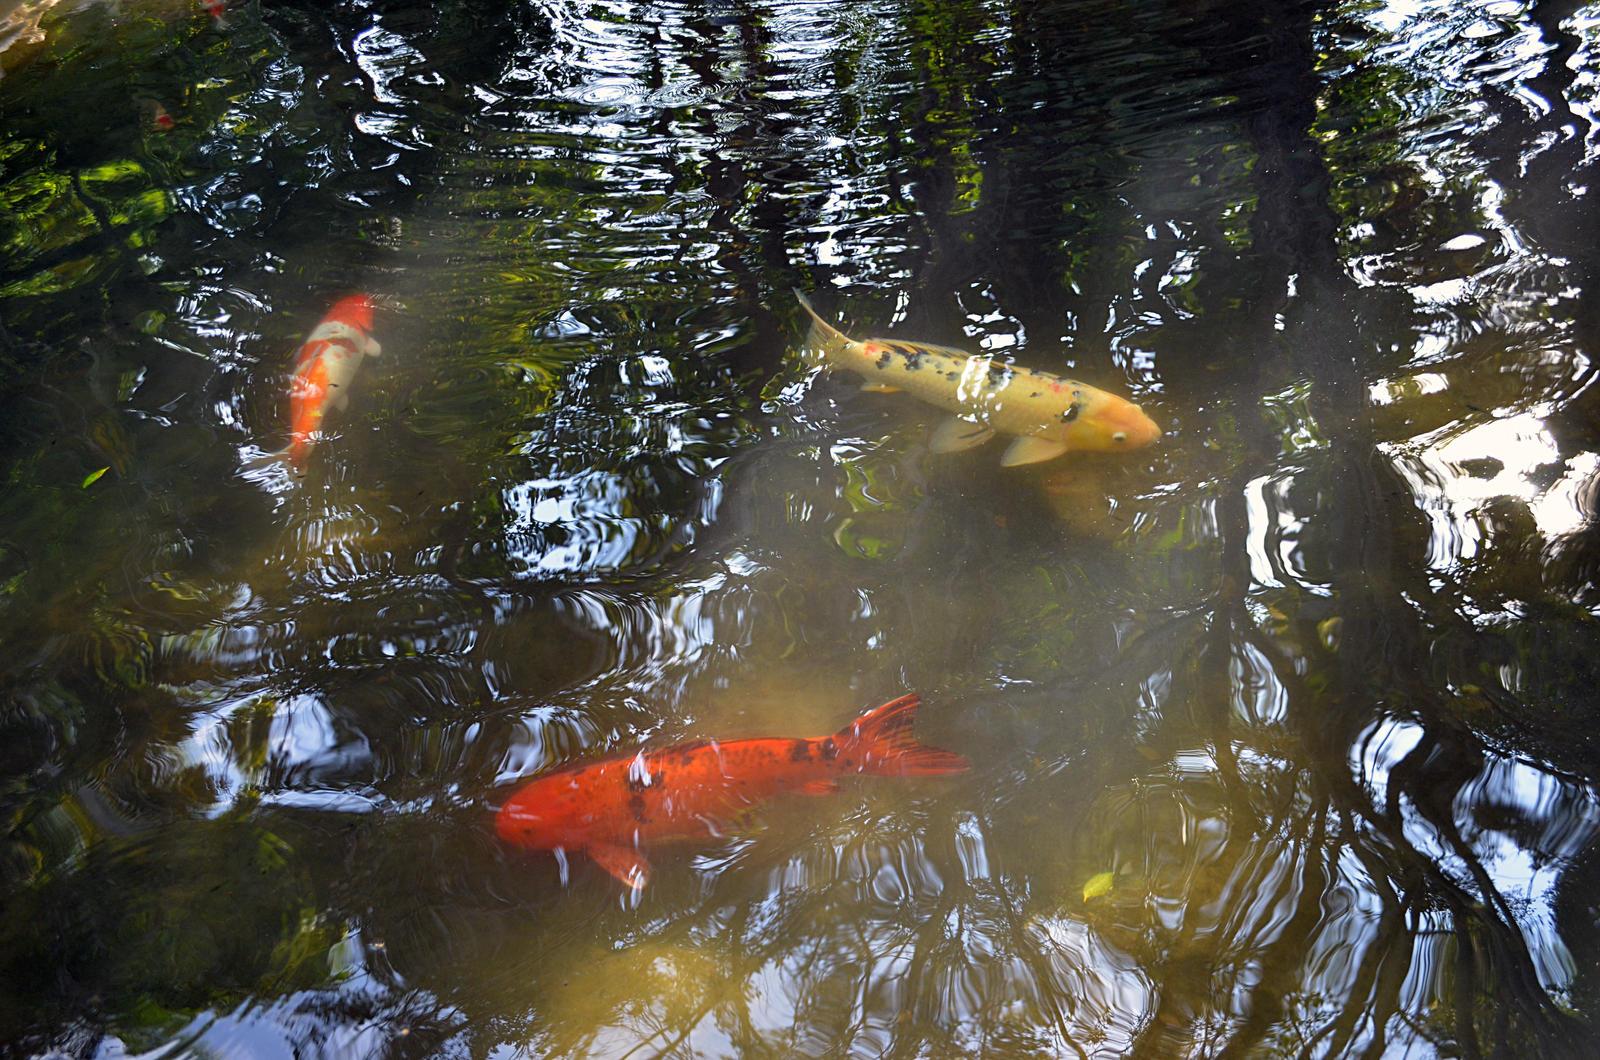 Koi Fish Pond Stock Photo Dsc 0700 By Annamae22 On Deviantart